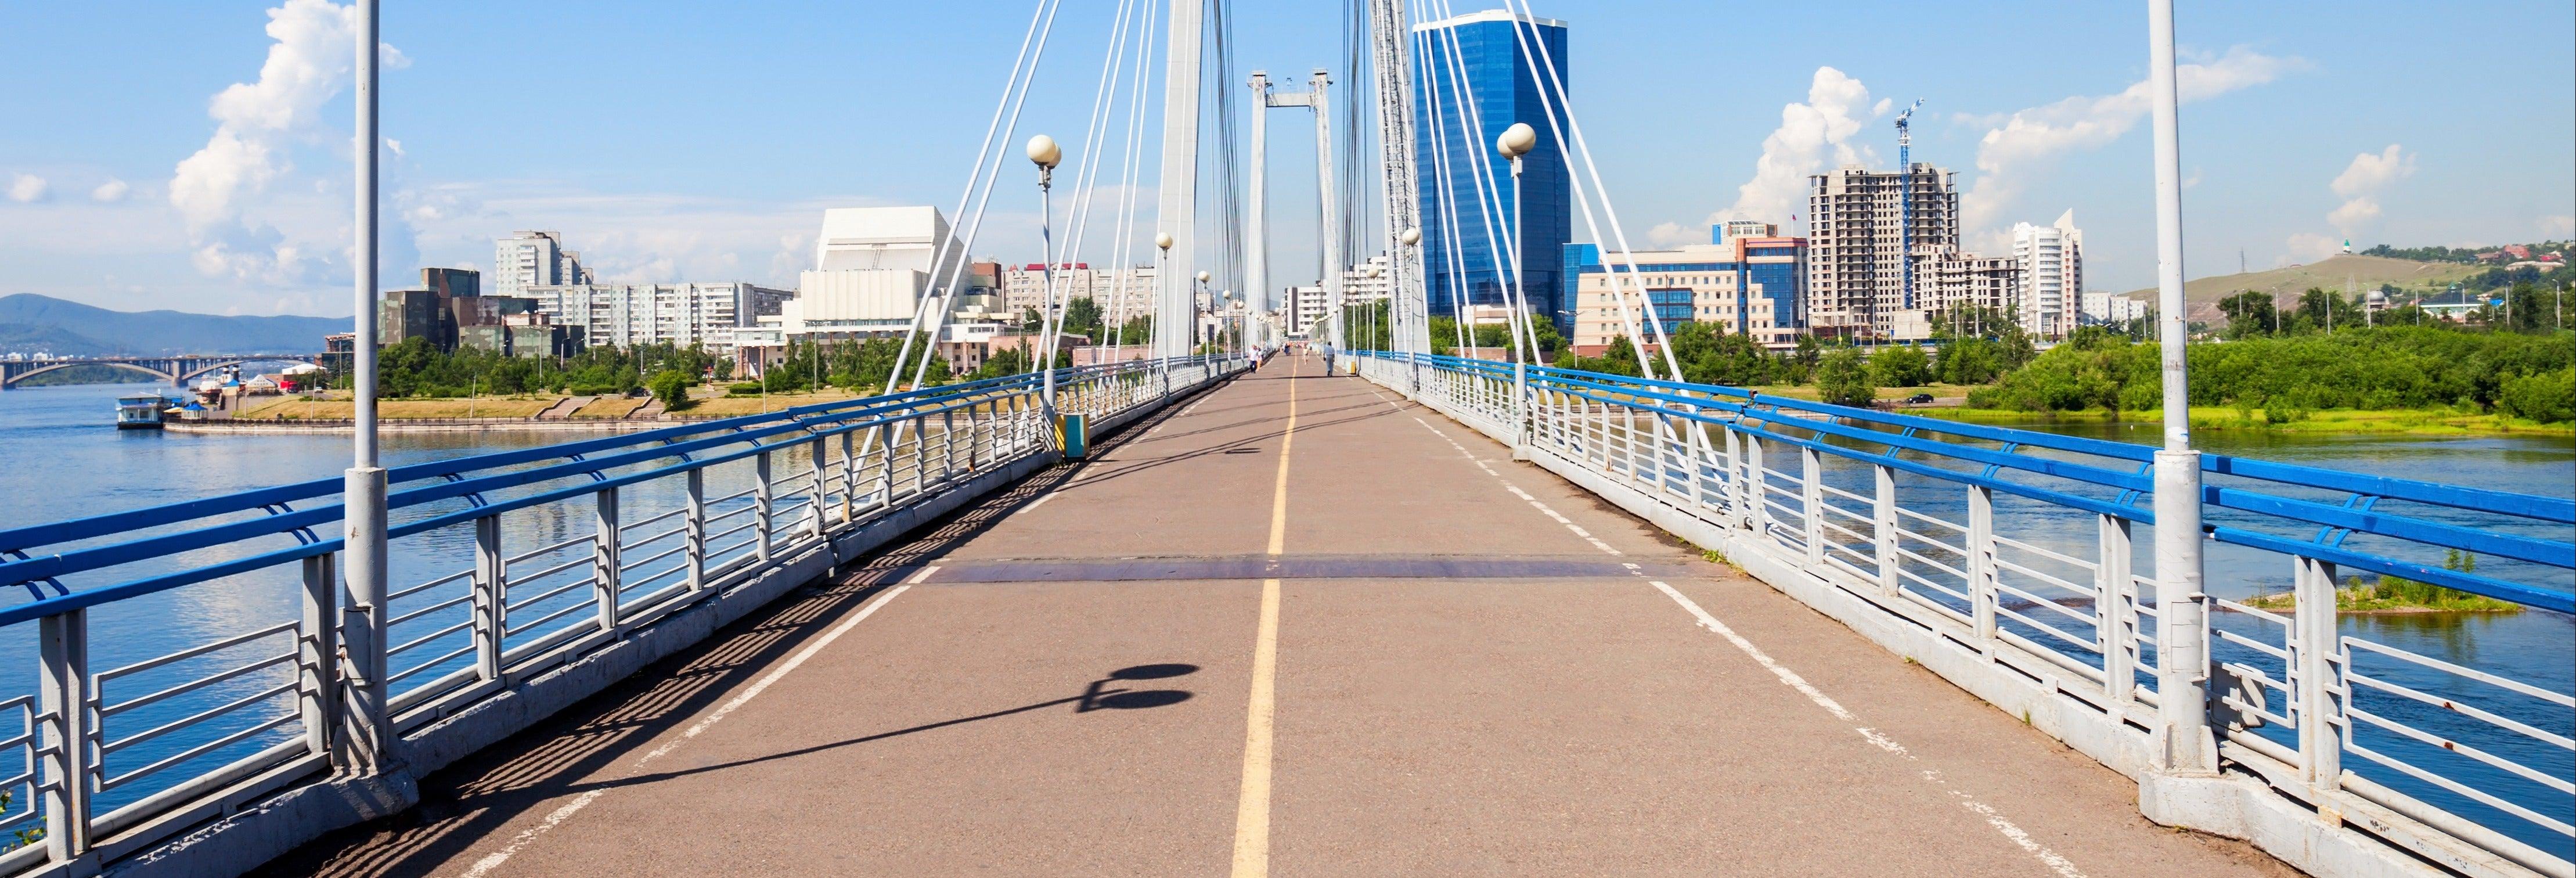 Krasnoïarsk